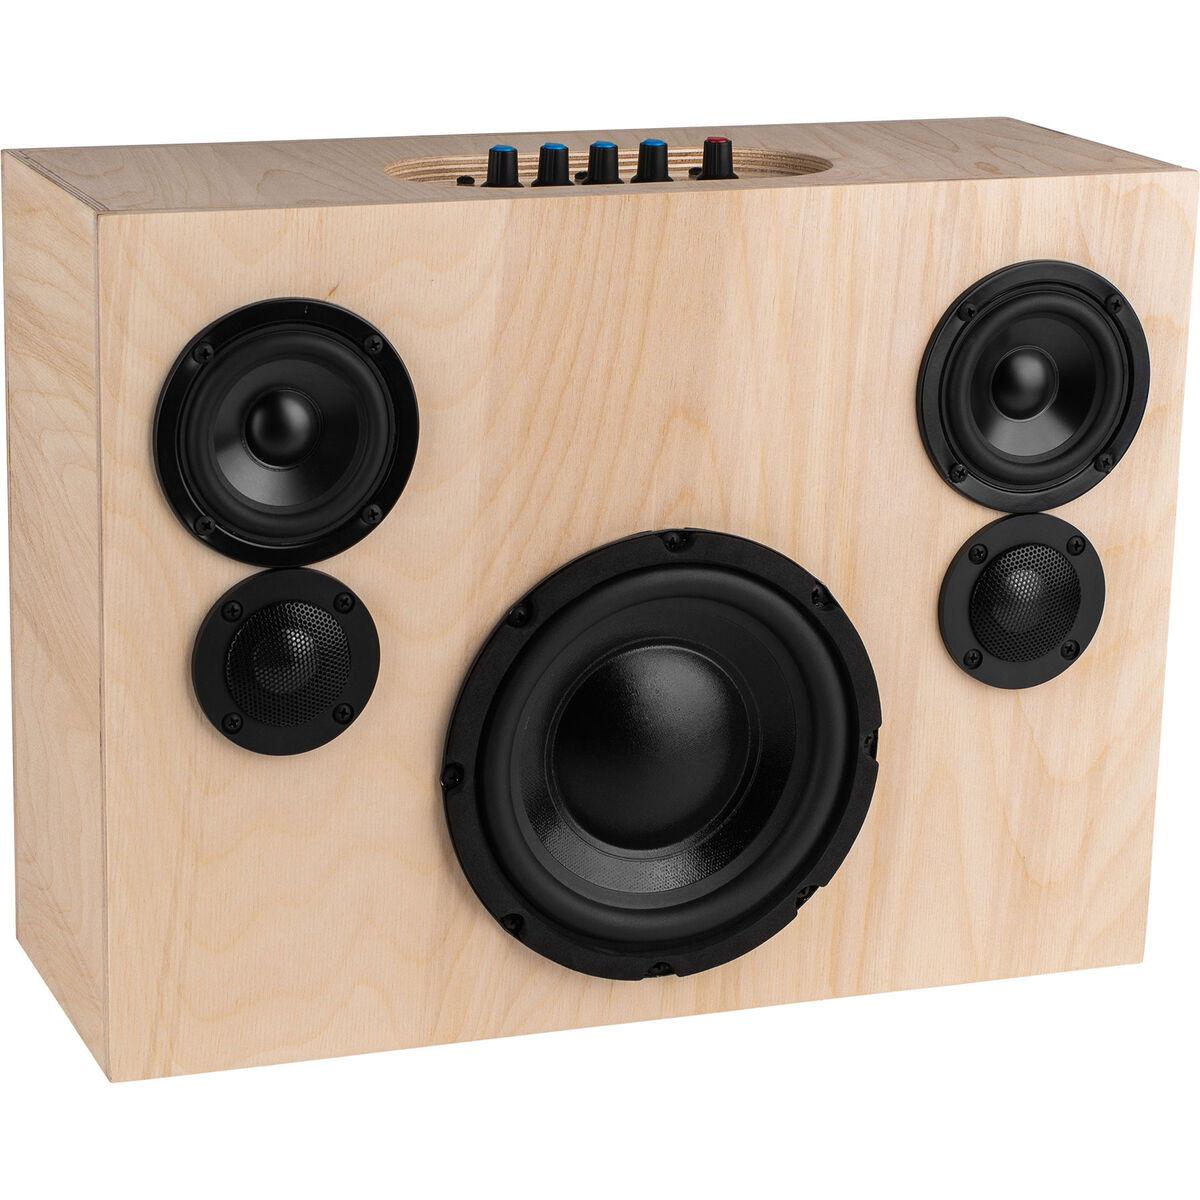 Blast Box 10 Watt Portable Bluetooth Speaker Kit